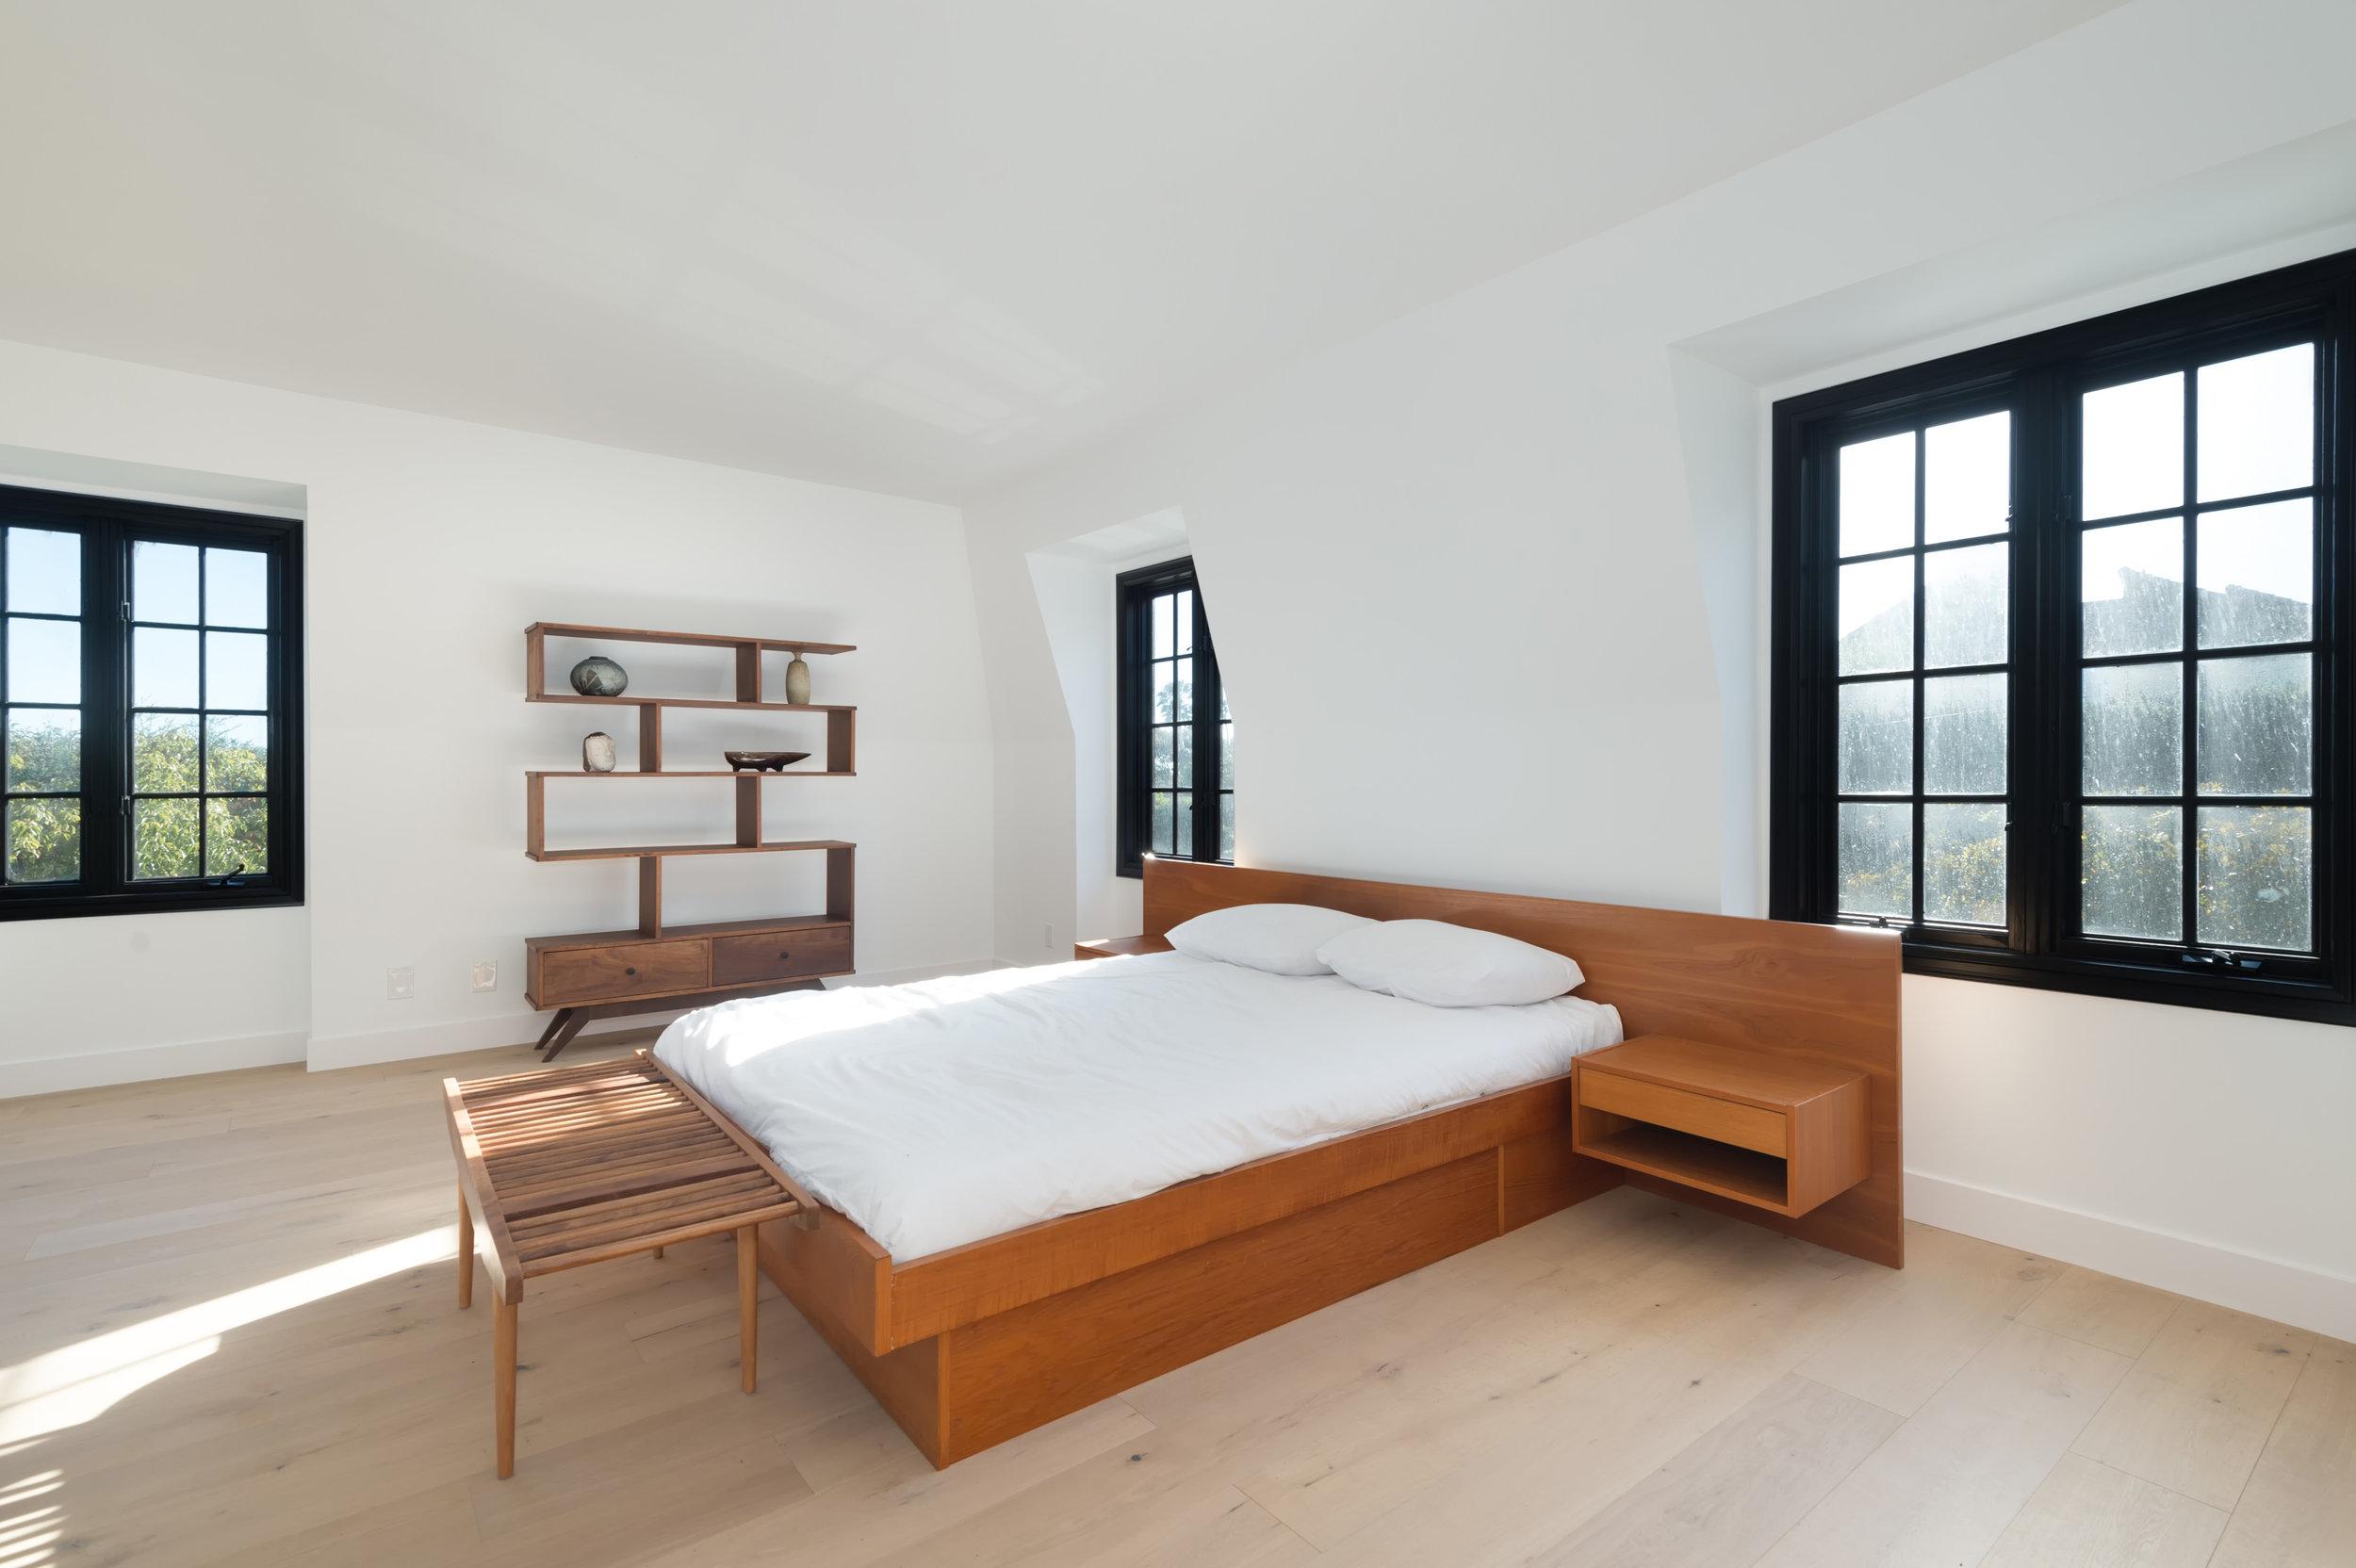 014.1 bedroom 30340 Morning View Malibu For Sale The Malibu Life Team Luxury Real Estate.jpg